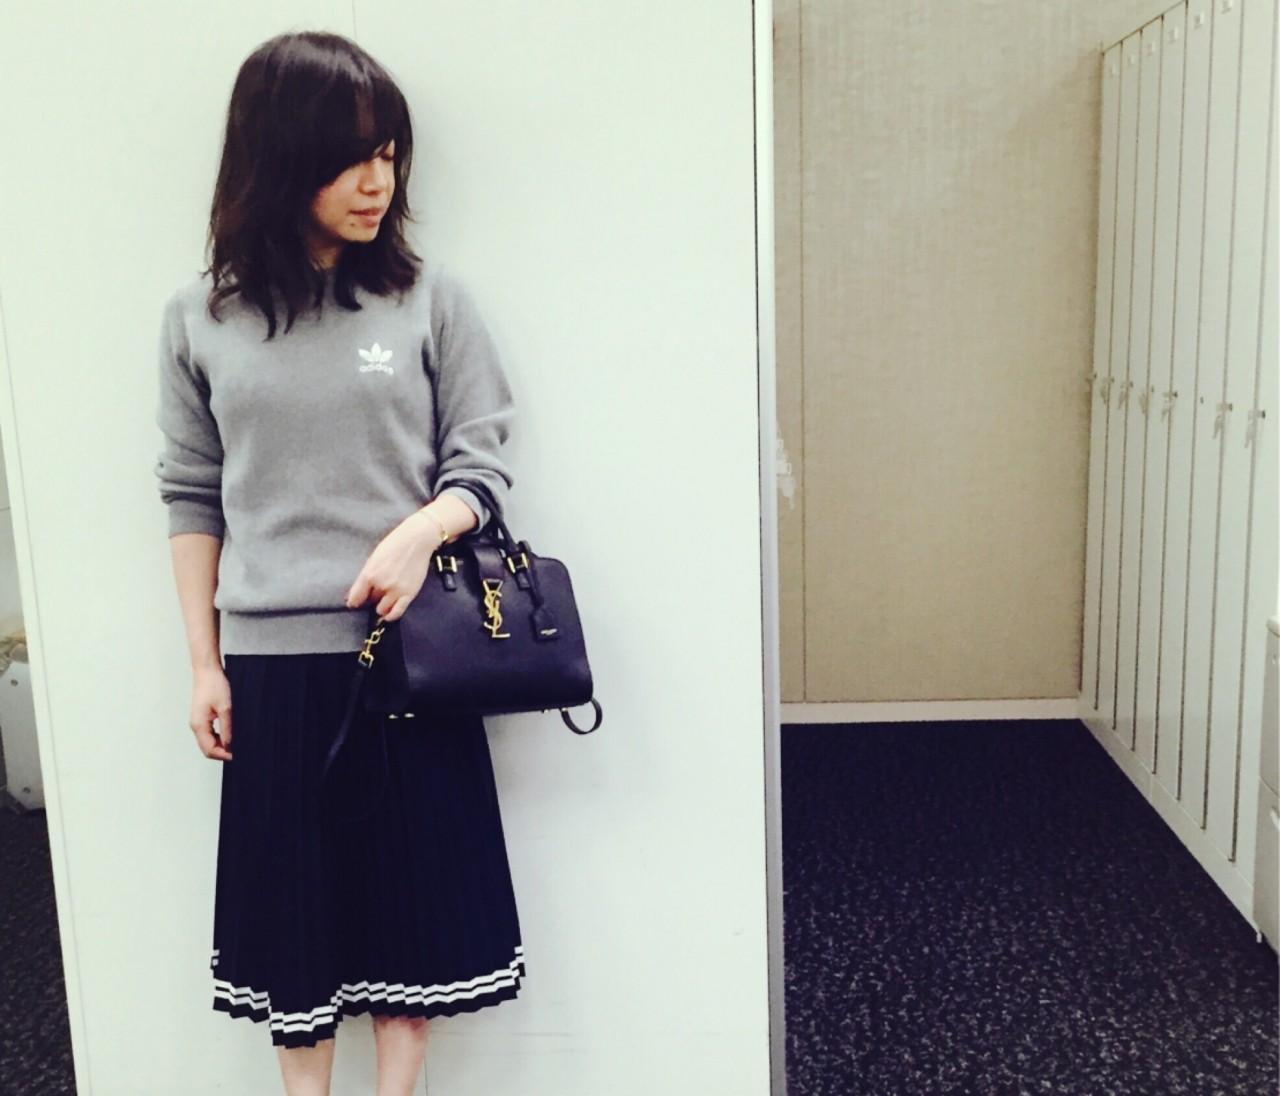 【#OOTD】編集ナベ嬢、アディダス×HYKEのトップスにプリーツスカート♩